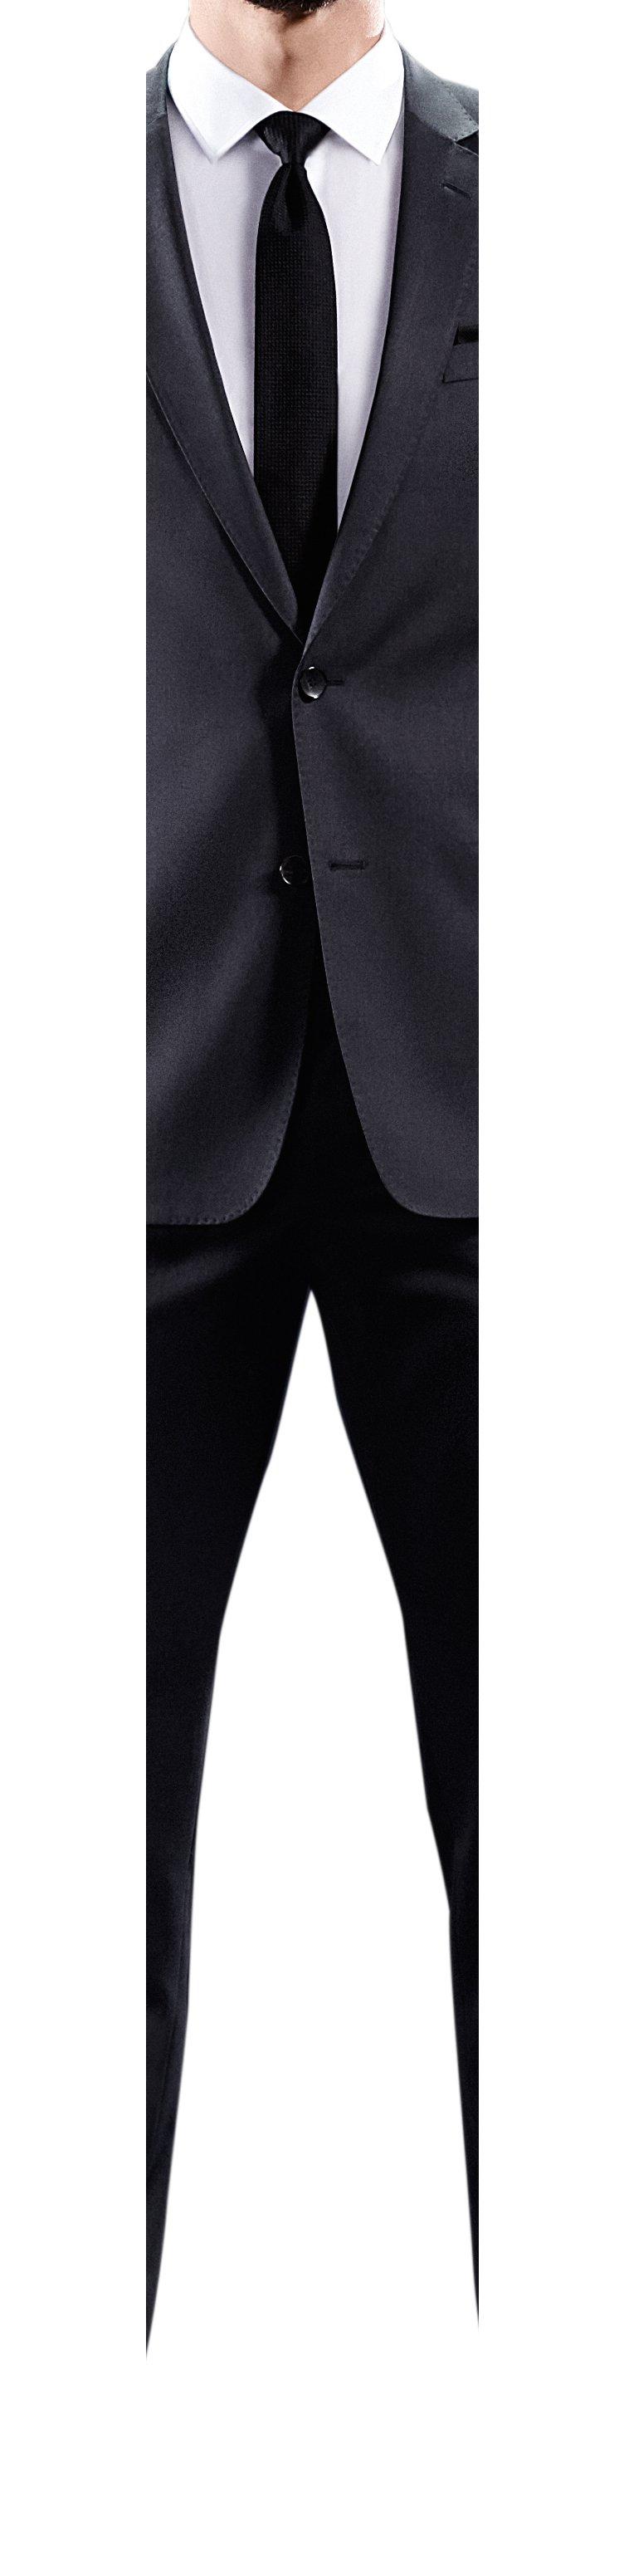 Mats Hummels in BOSS suit